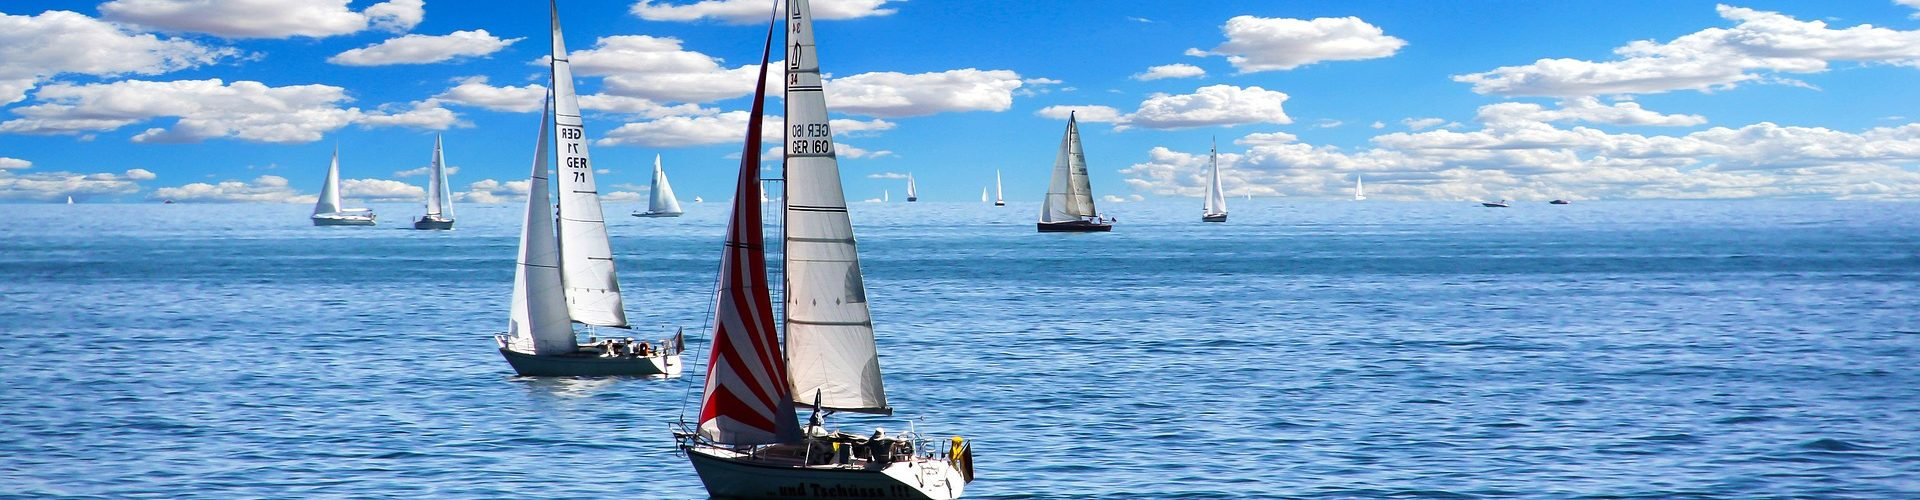 segeln lernen in Niefern Öschelbronn segelschein machen in Niefern Öschelbronn 1920x500 - Segeln lernen in Niefern-Öschelbronn